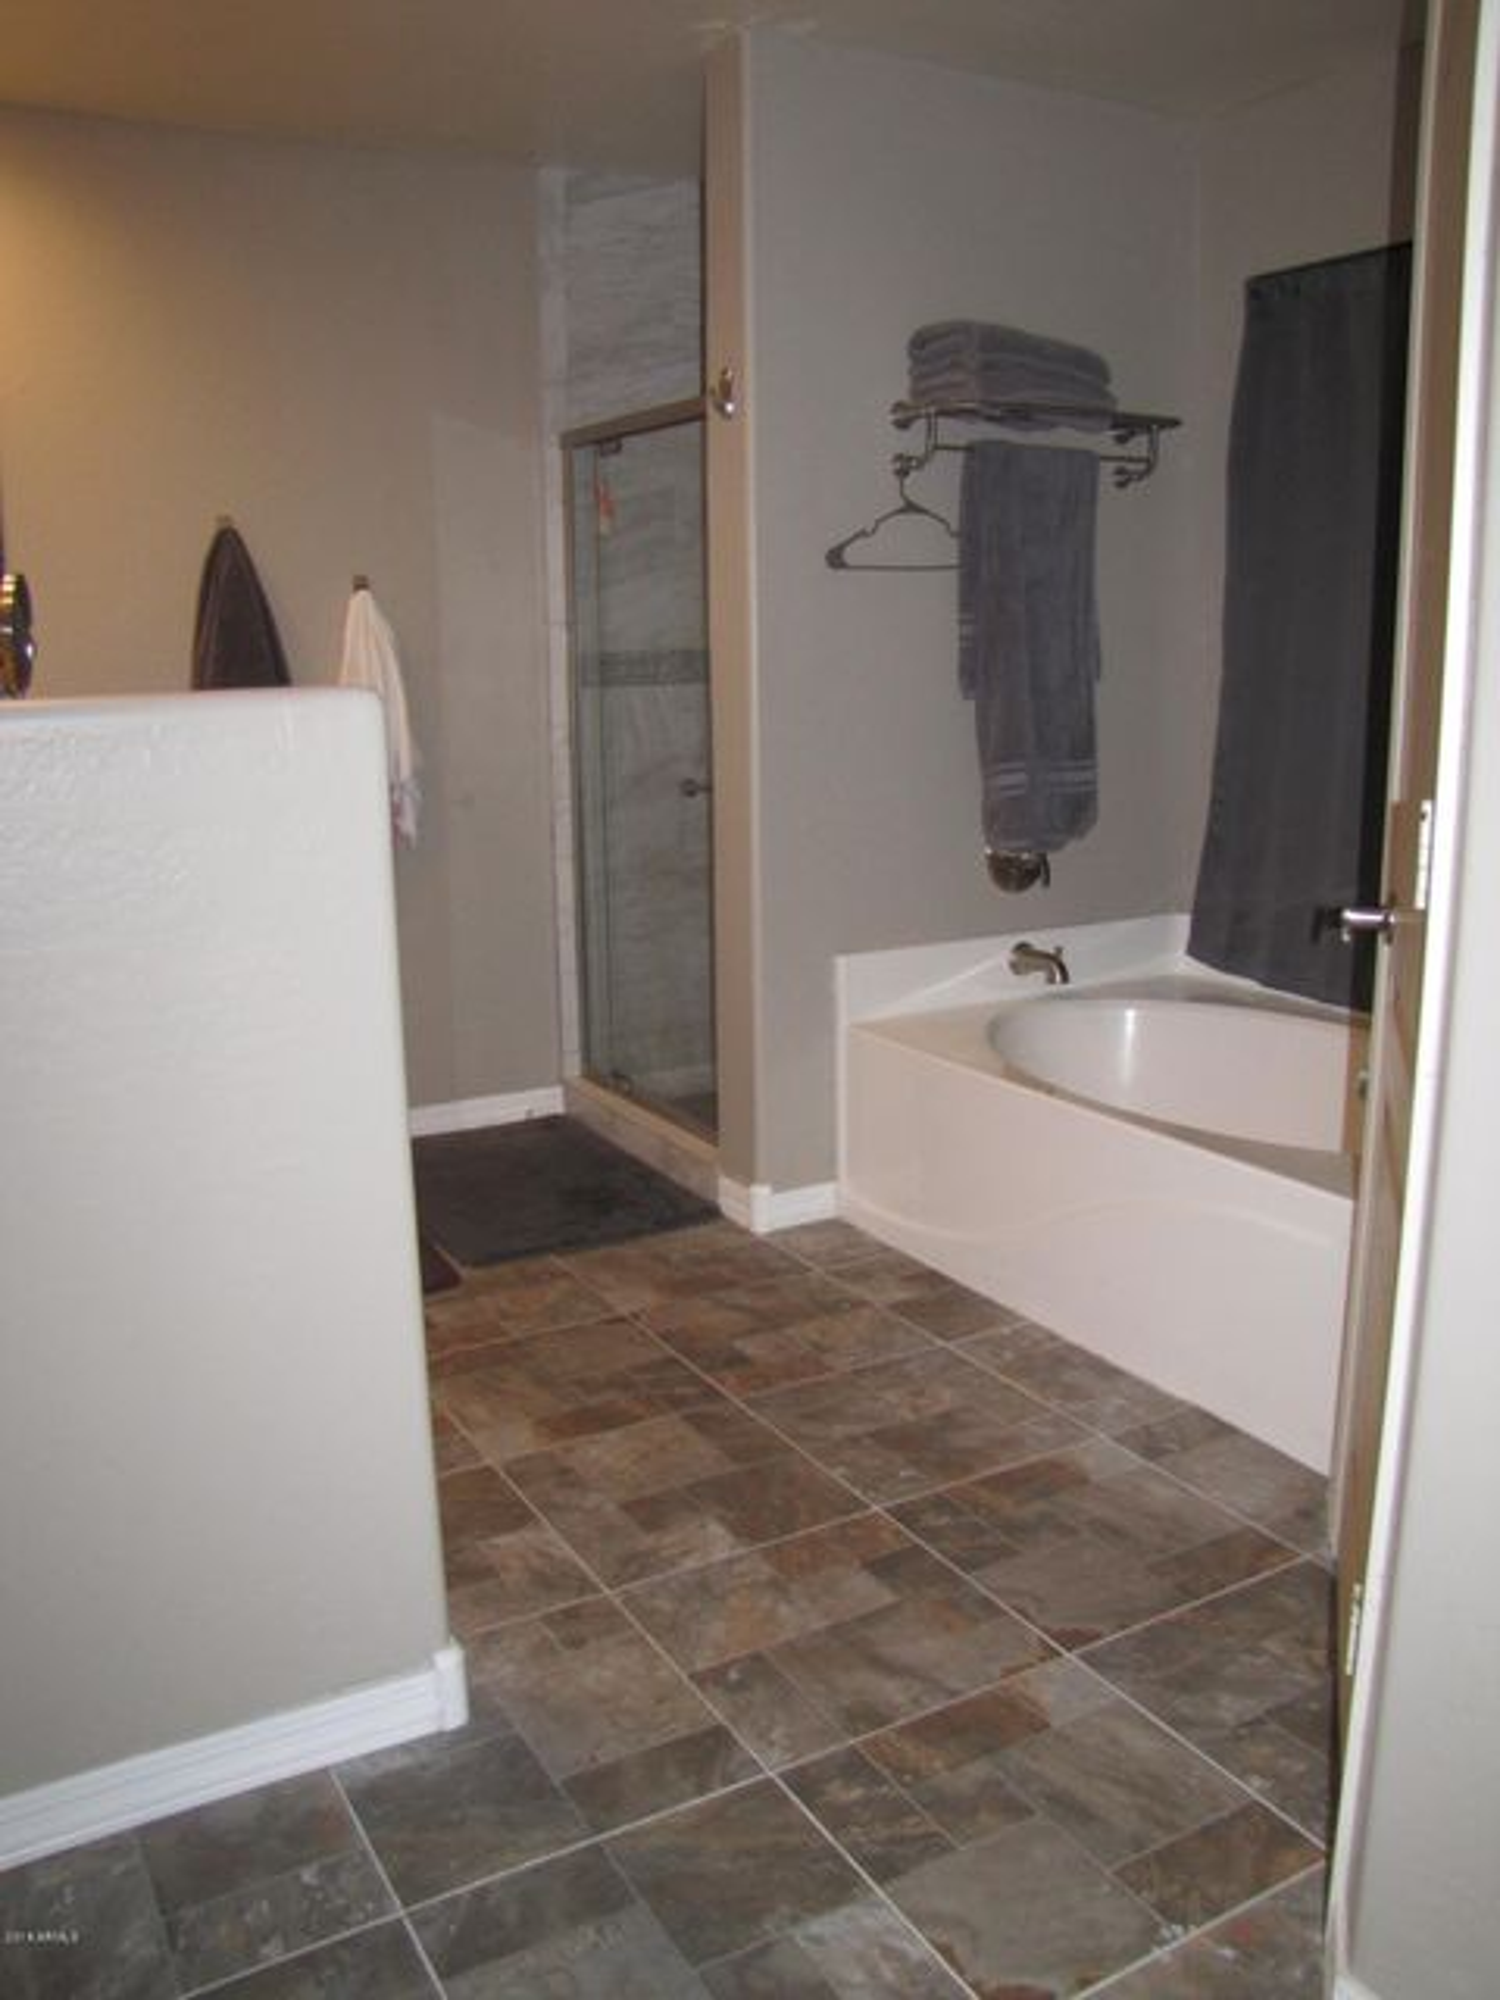 MLS 5770991 3579 N EXCALIBUR Place, Casa Grande, AZ 85122 Casa Grande AZ Avalon